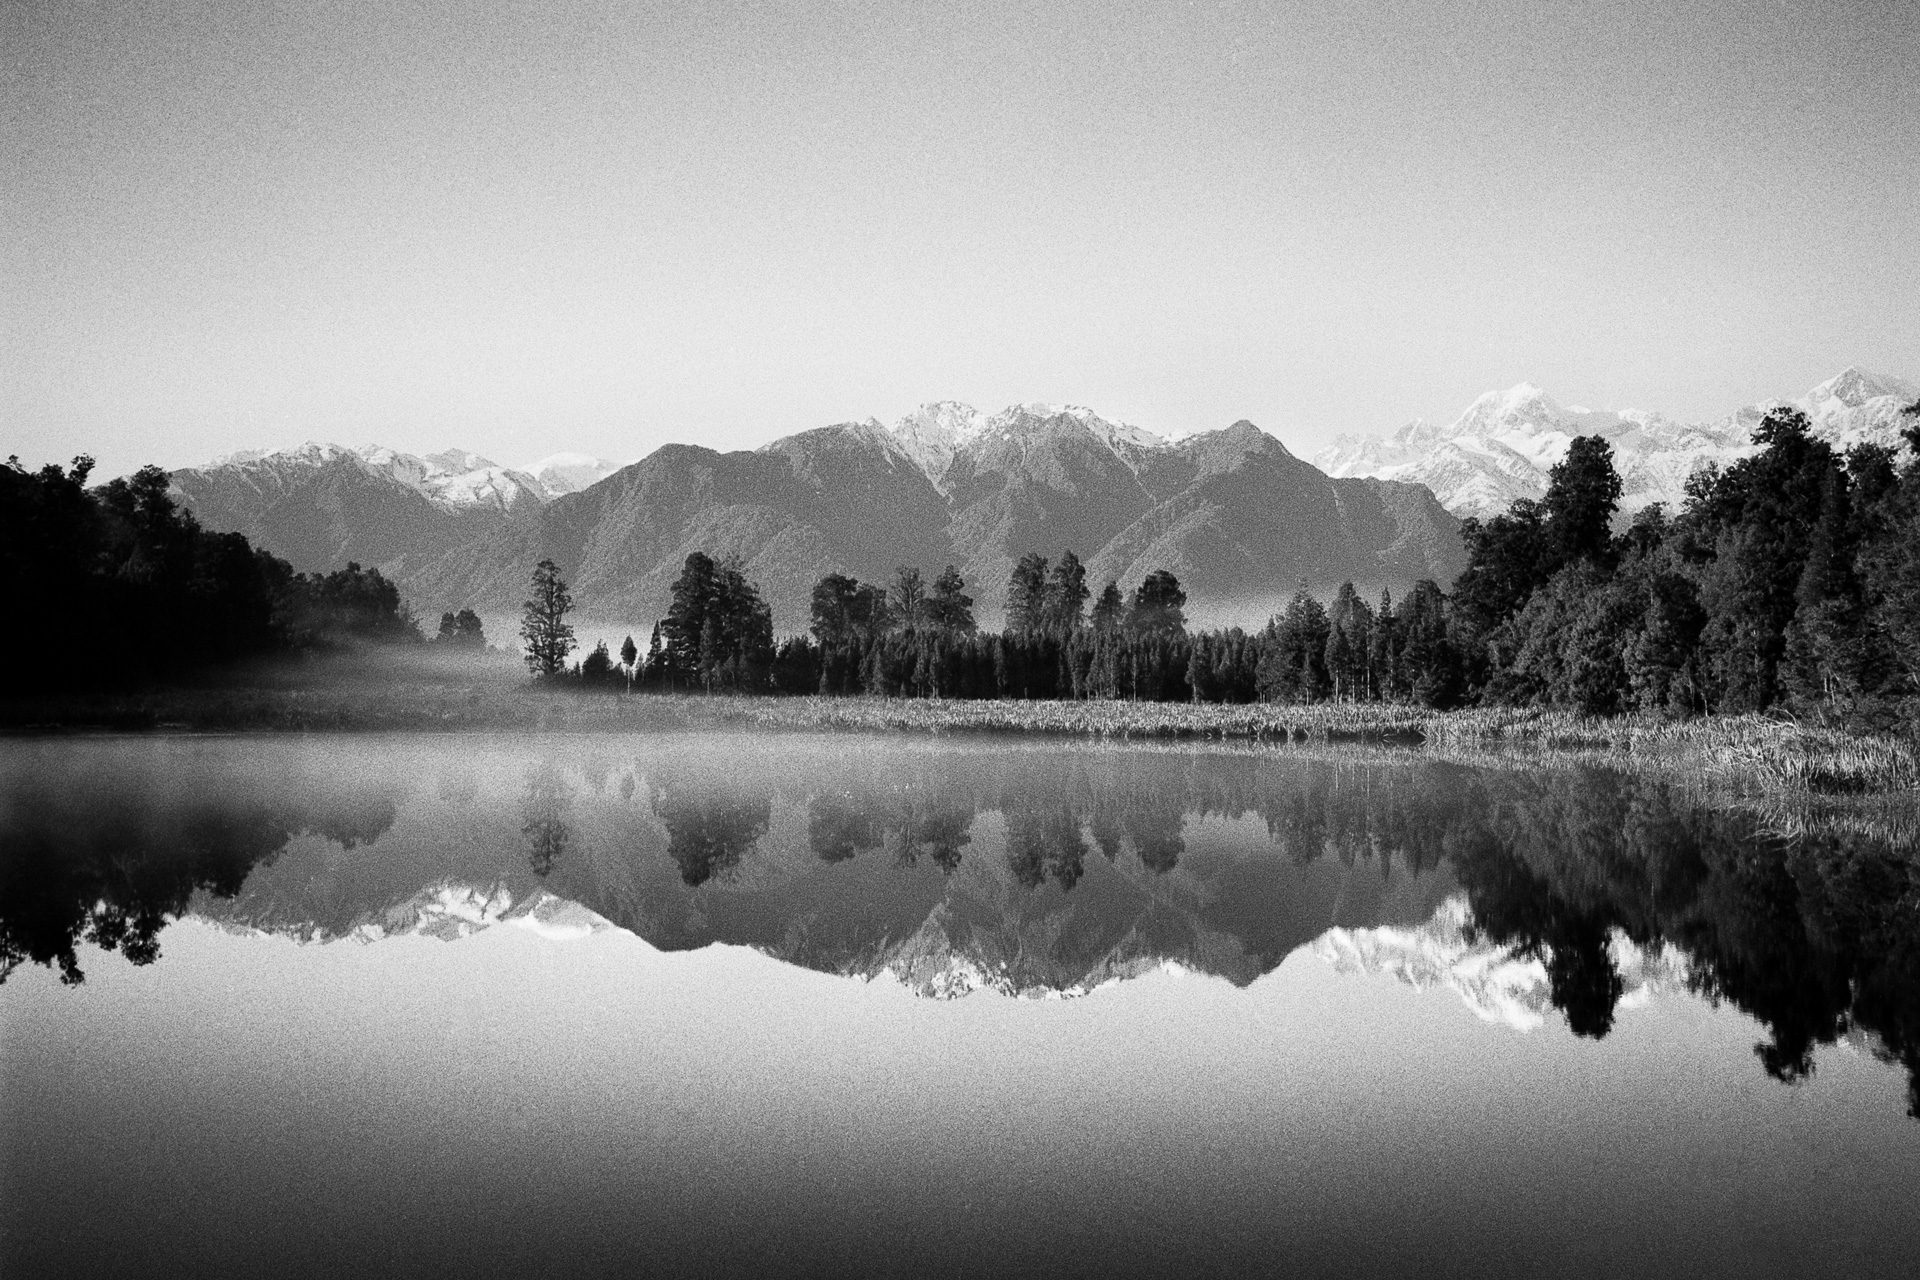 @paulasmithphoto Lake Matheson, New Zealand taken on my travels. Shot on @ILFORDPhoto Delta 100, with Leica MP & 35mm Summicron developed rodinal 1+25 9mins. #ilfordphoto #fridayfavourites #shotondelta100